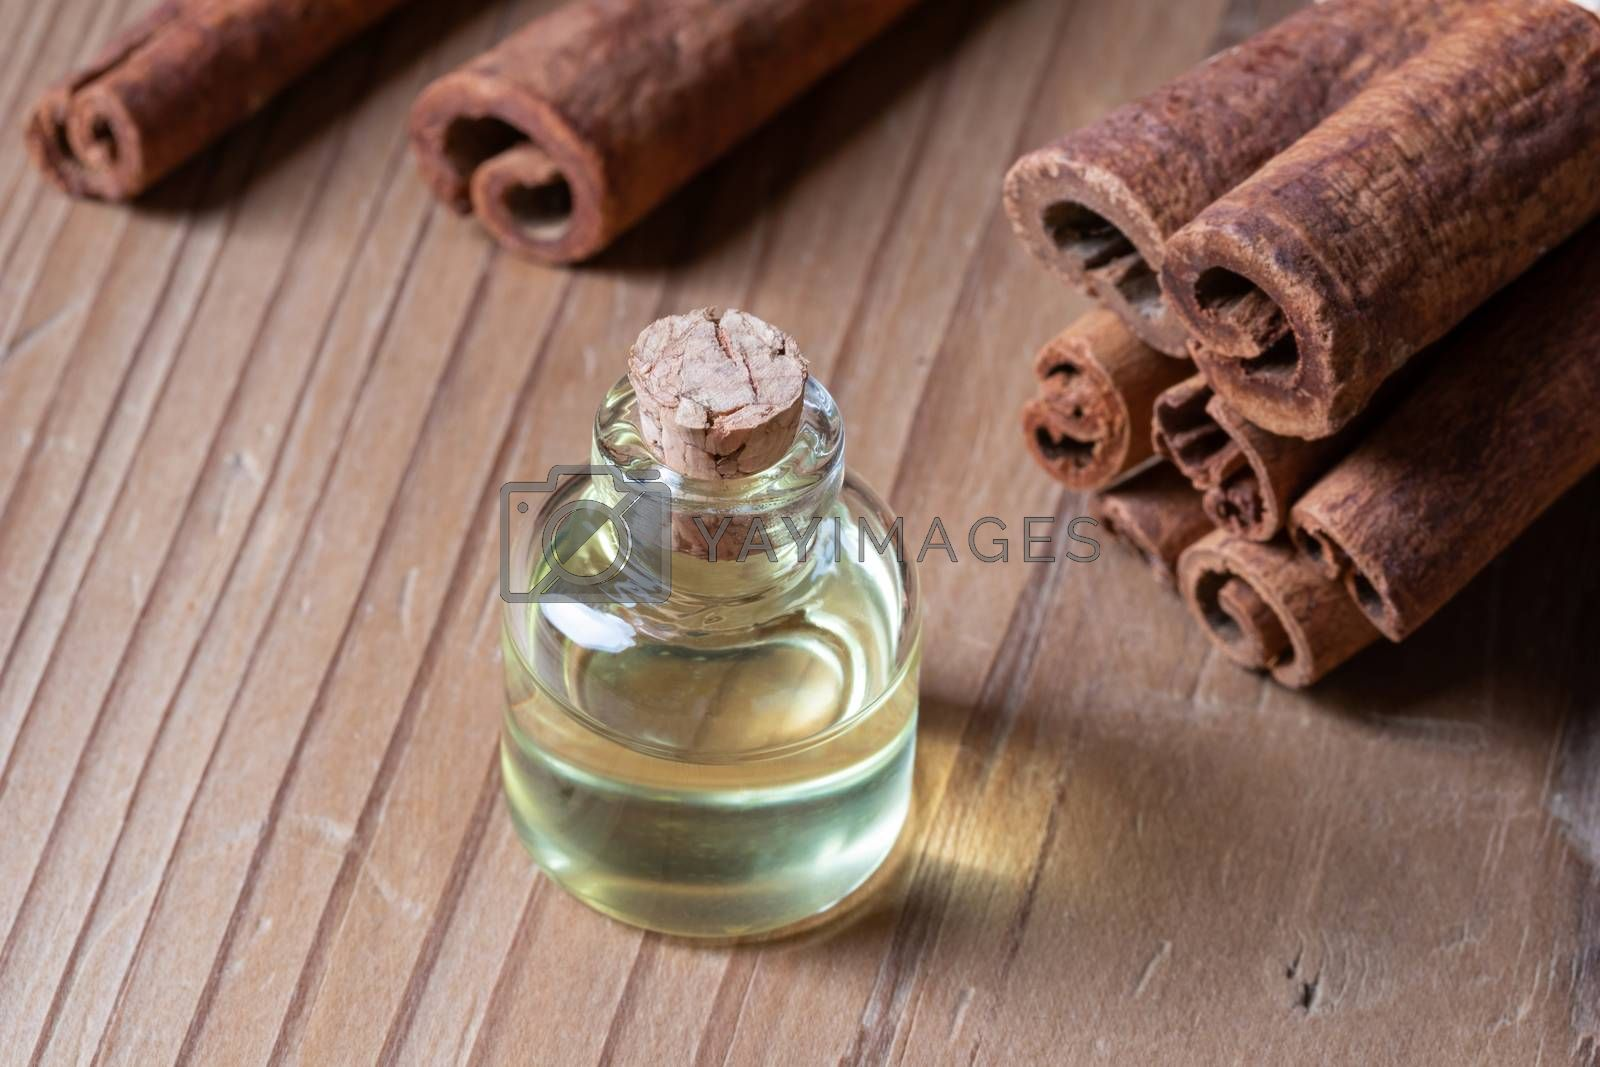 A bottle of cinnamon essential oil